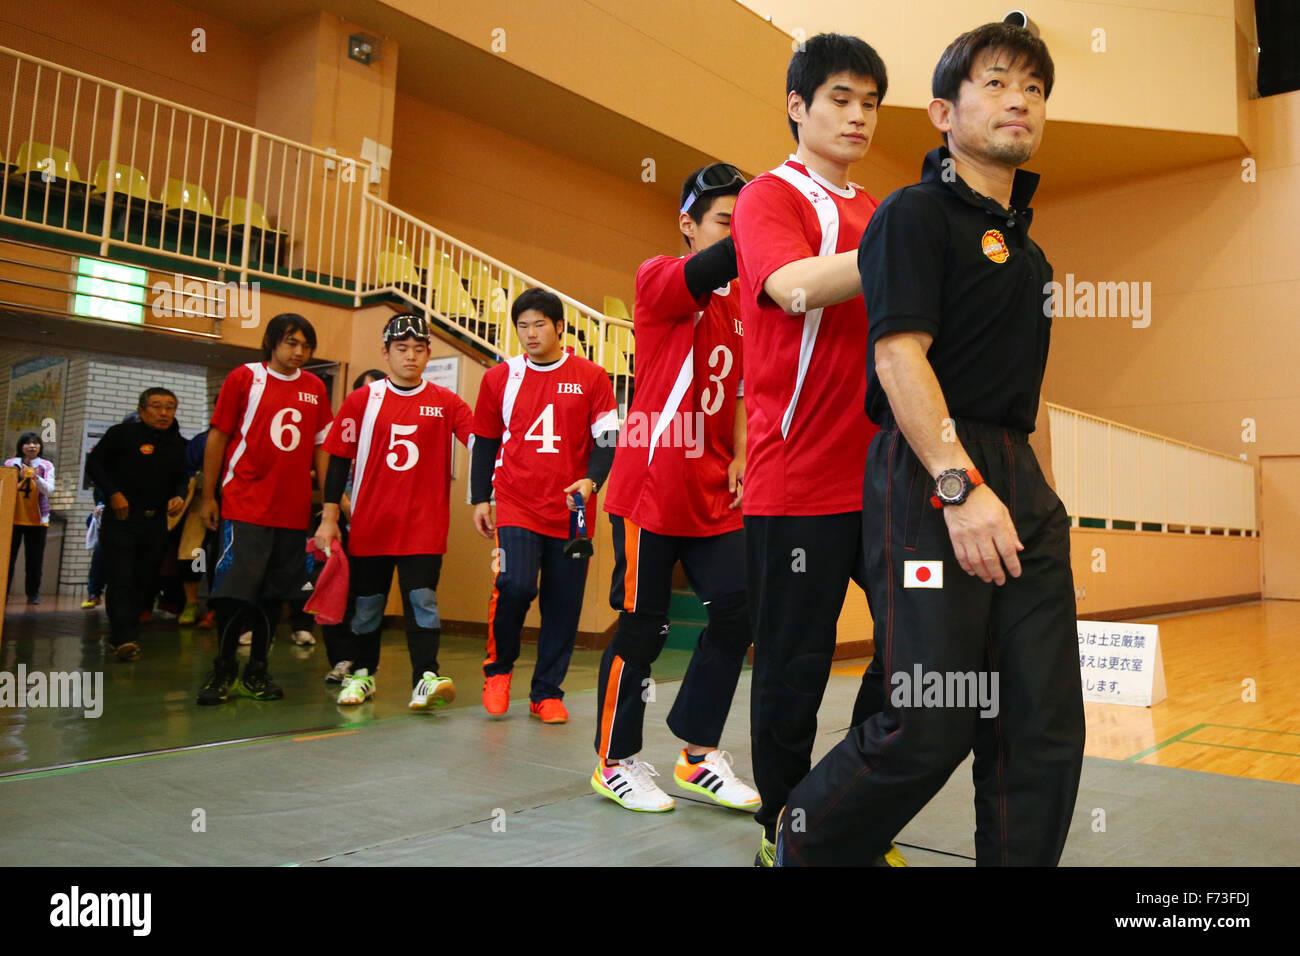 NOVEMBER 21, 2015 - Goalball : 2015 Japan Goalball Championships Preliminary round match between Kokureha Men's Team Kaminari - IBK at Ohme City general gymnasium, Tokyo, Japan. © Shingo Ito/AFLO SPORT/Alamy Live News Stock Photo